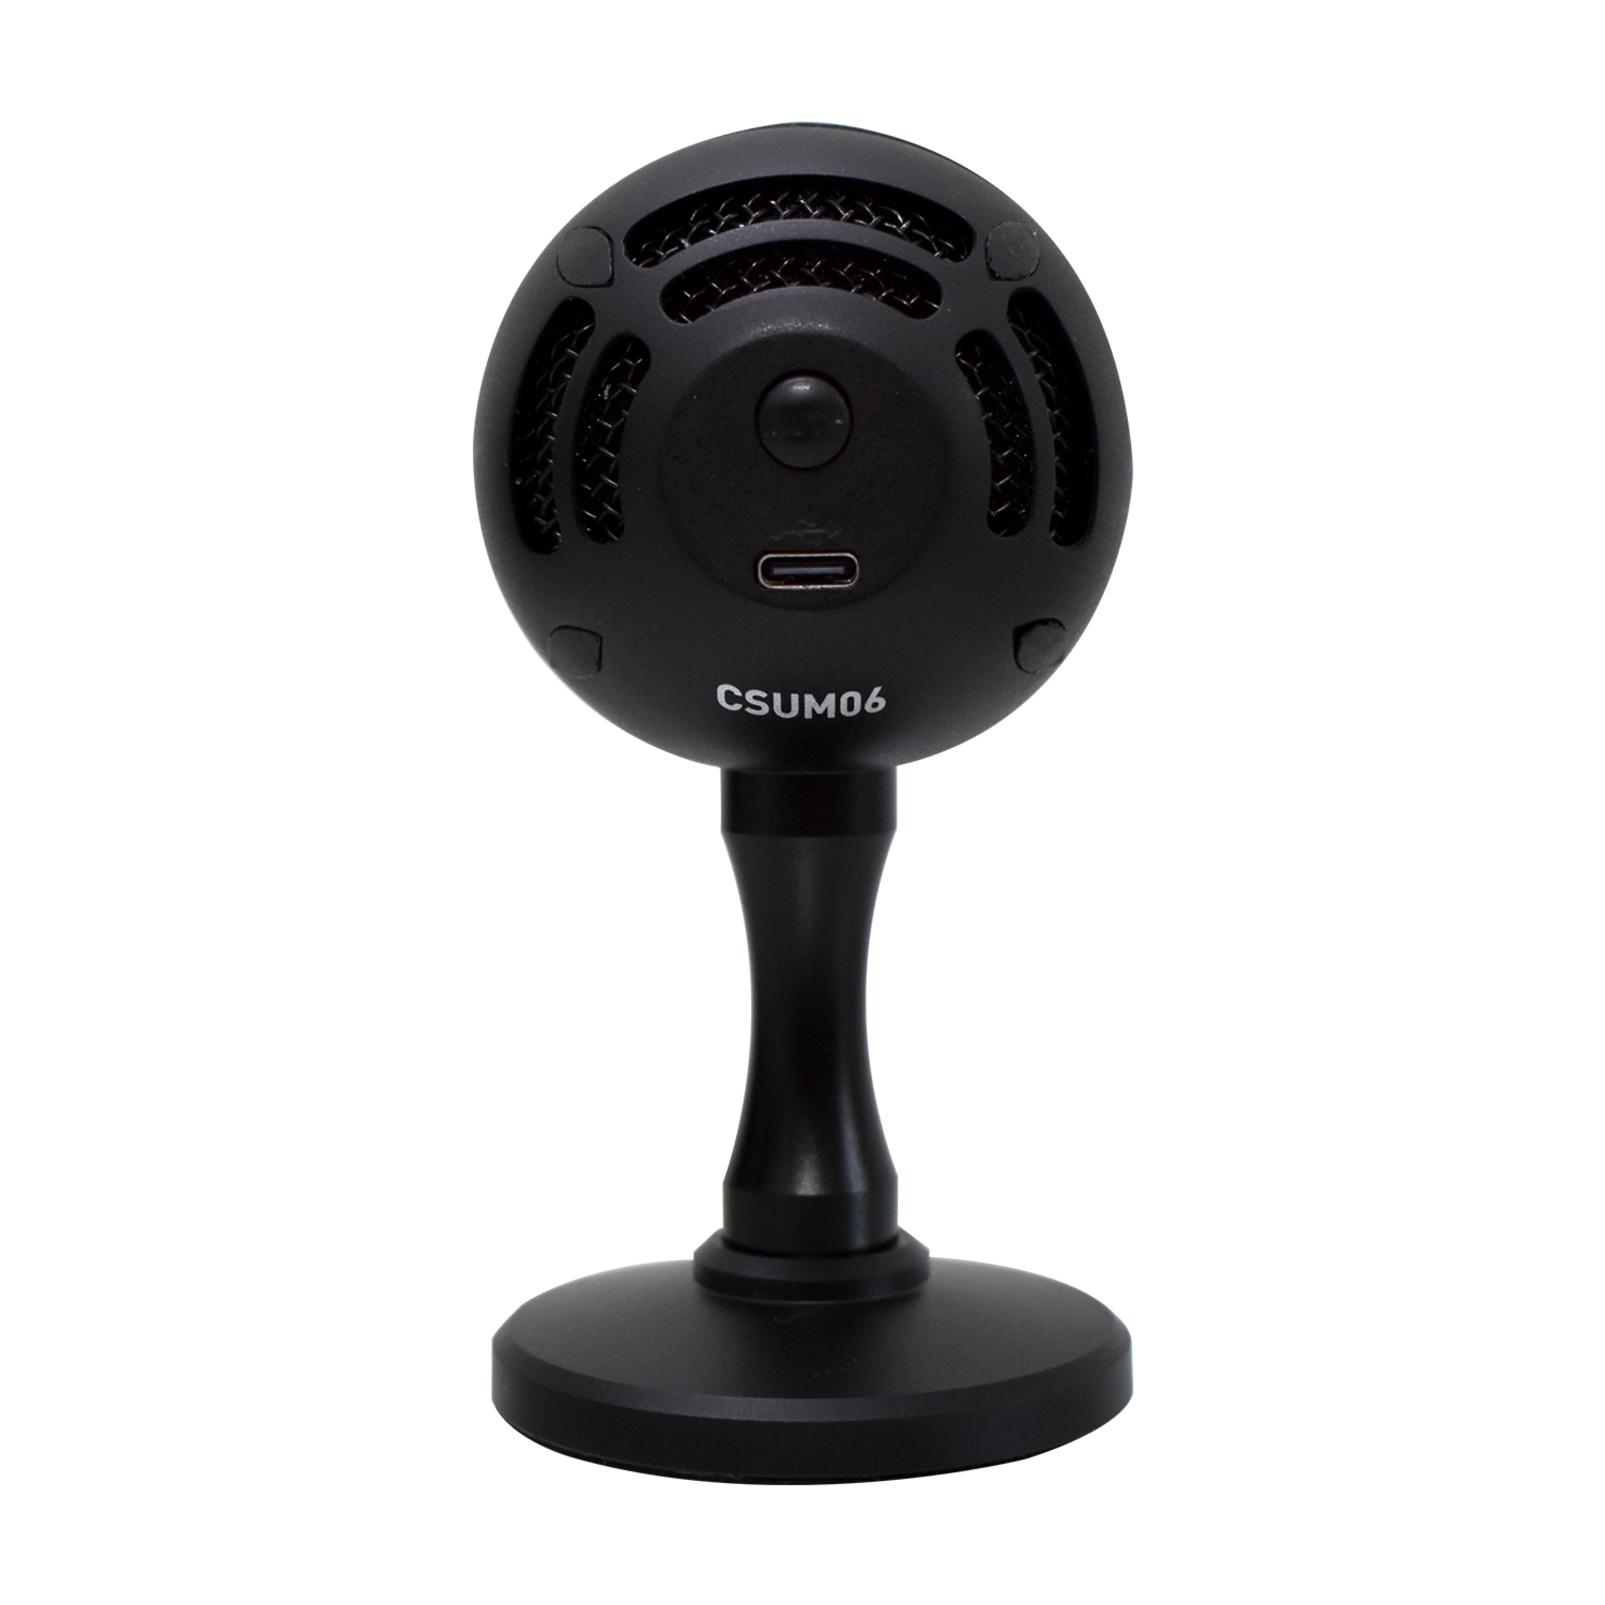 CSUM06 - Black - Mini USB Microphone - Back